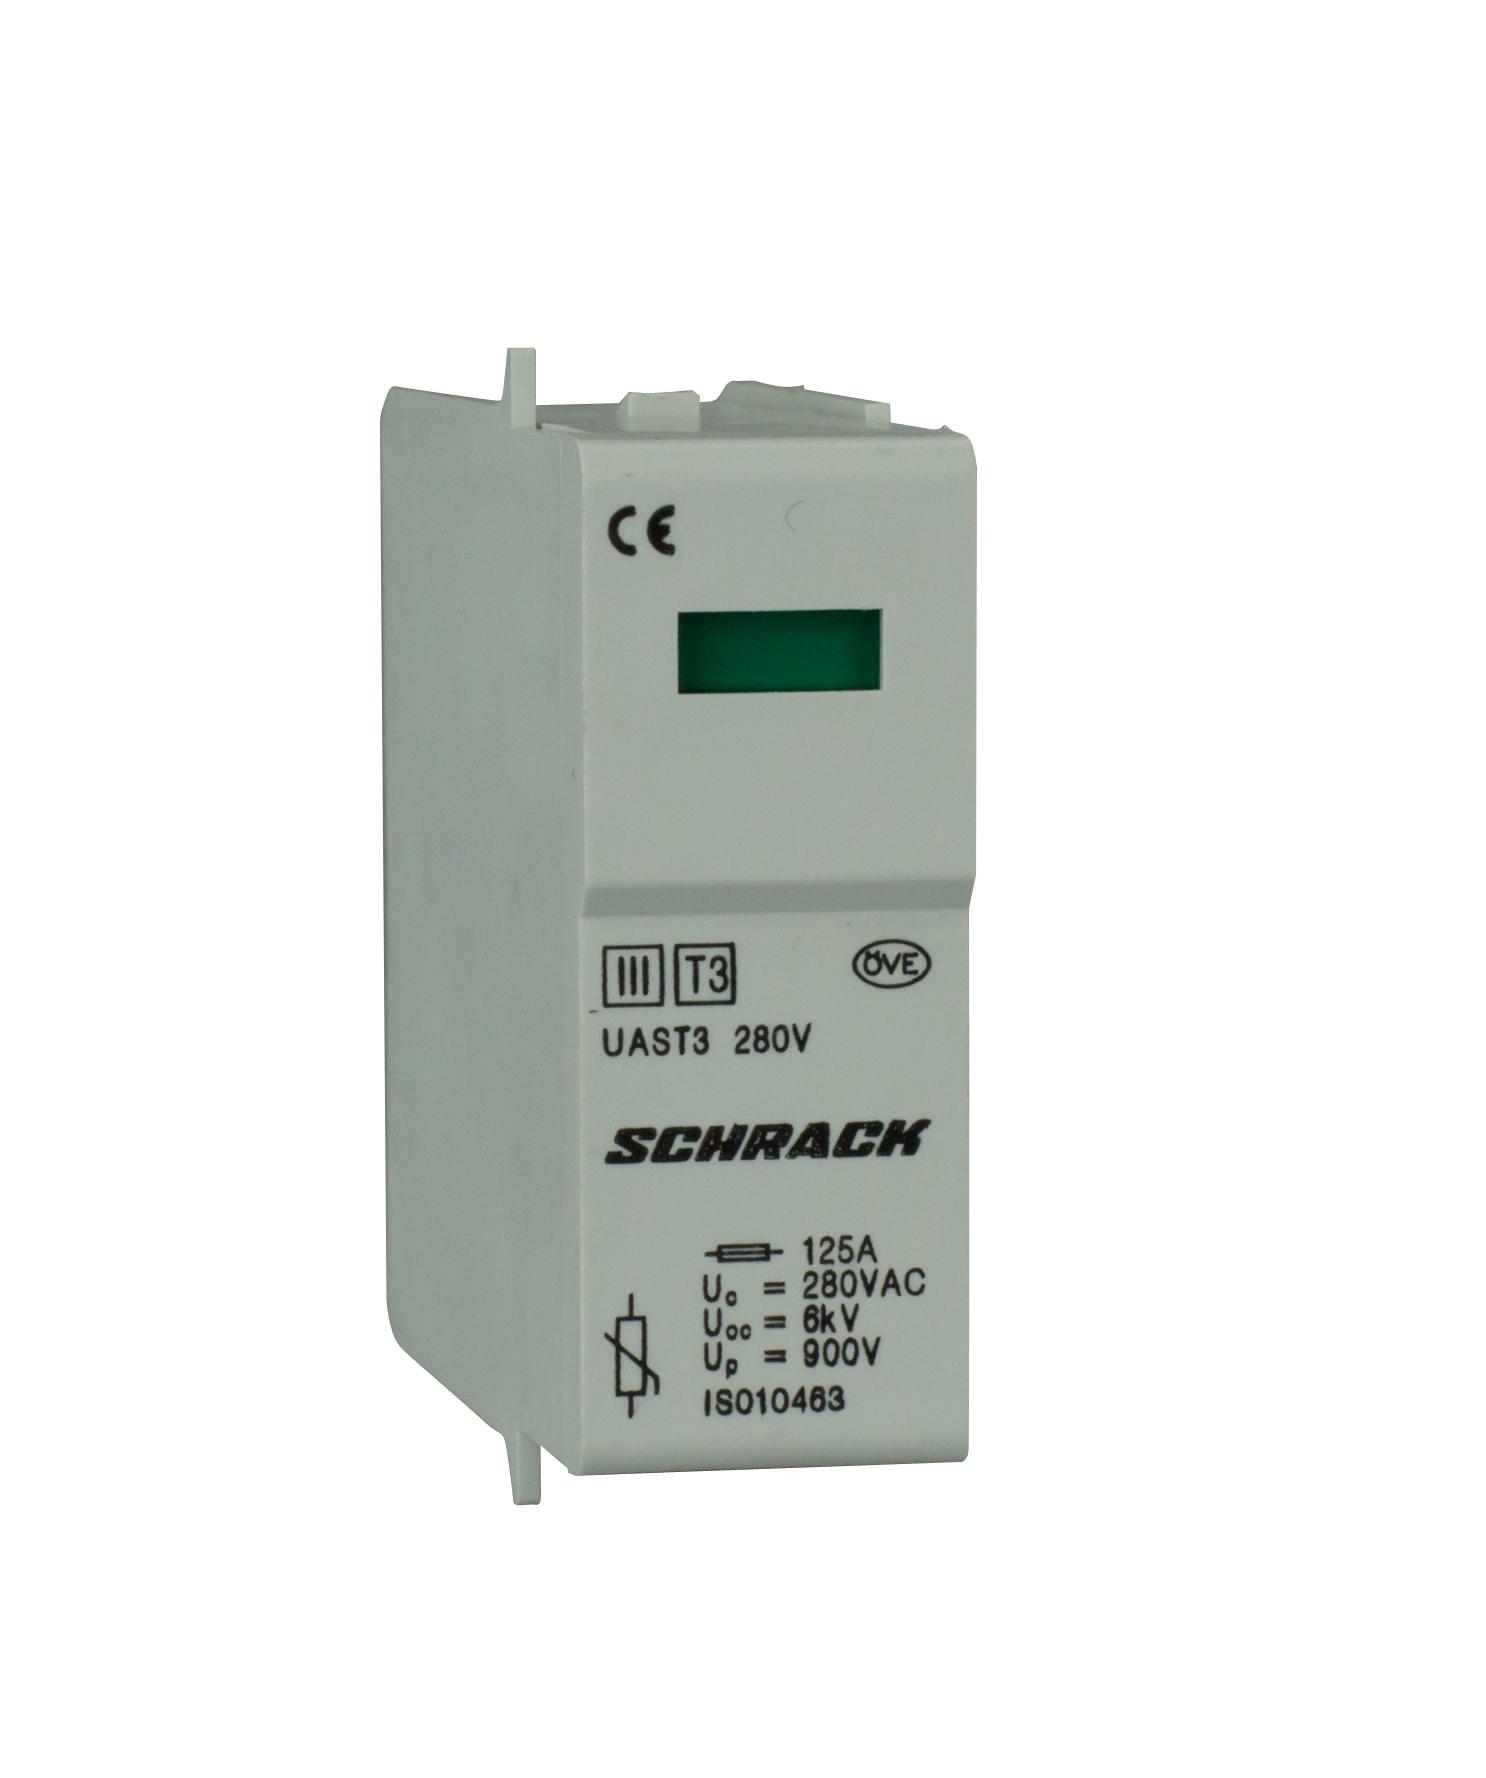 1 Stk T3/D - Ableitermoduleinsatz VV 280V - Serie UAS IS010463--